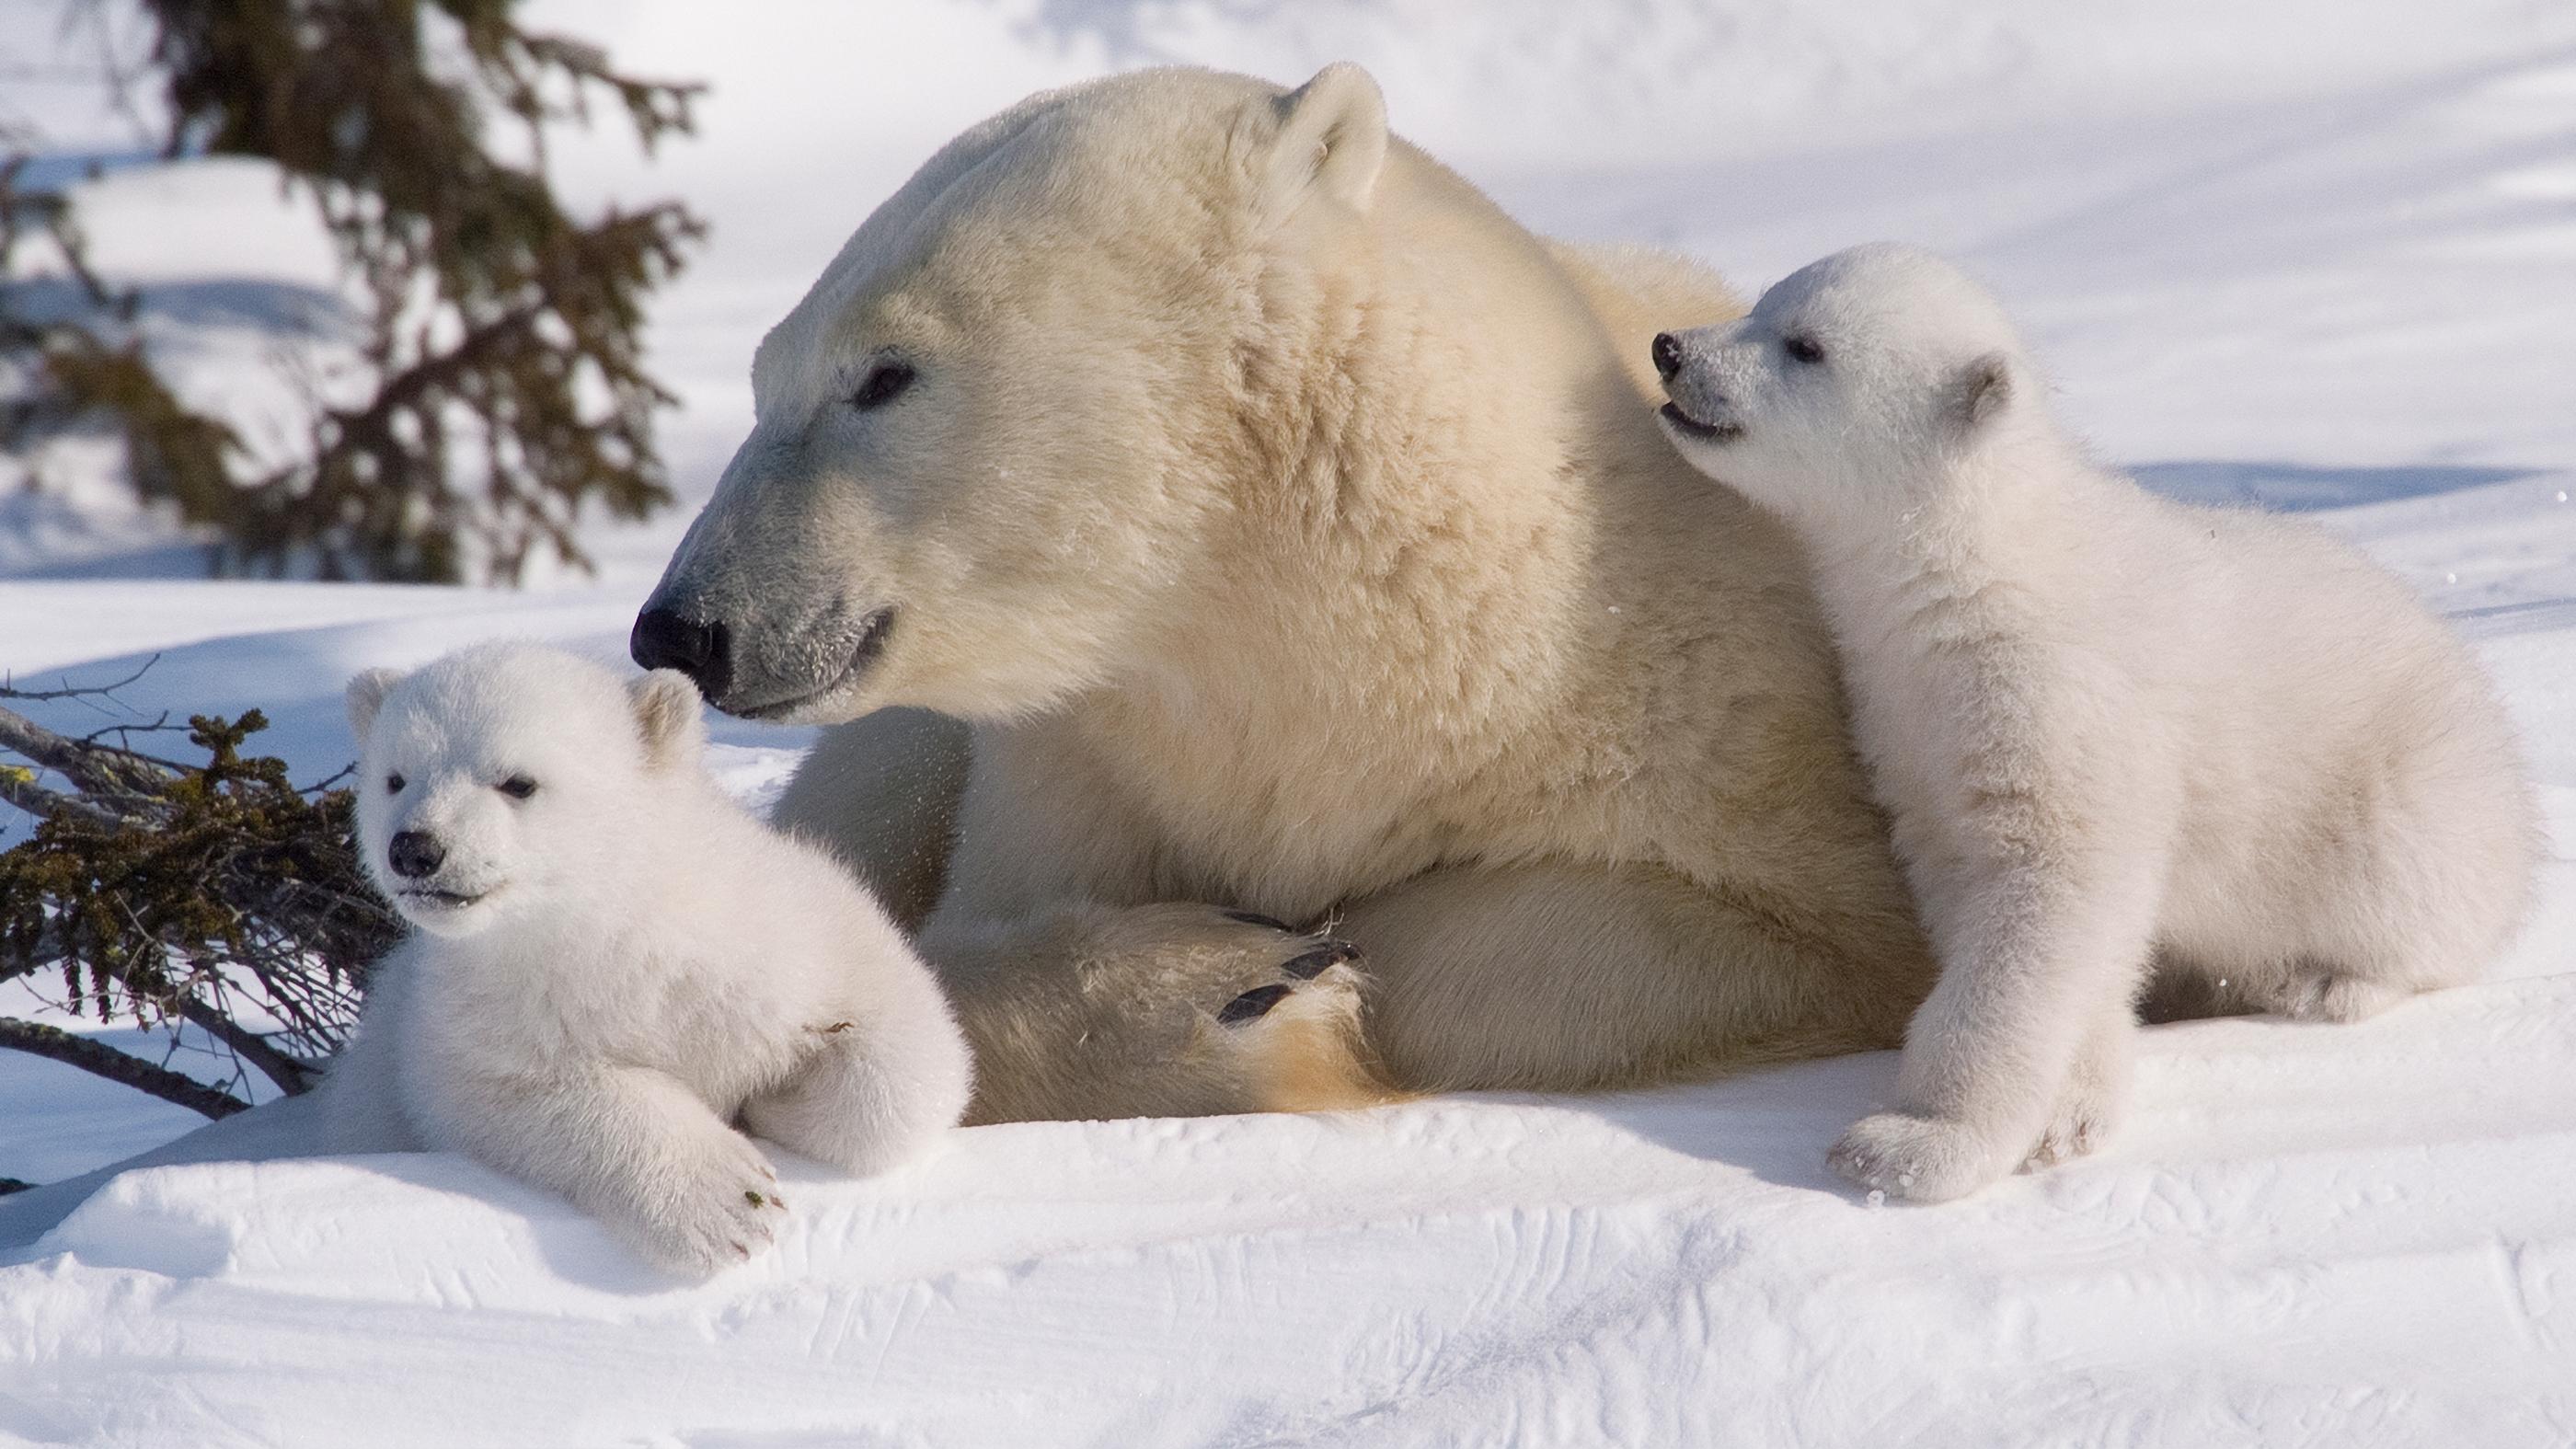 Drawn polar  bear educational Bear Kids small Bay Canada